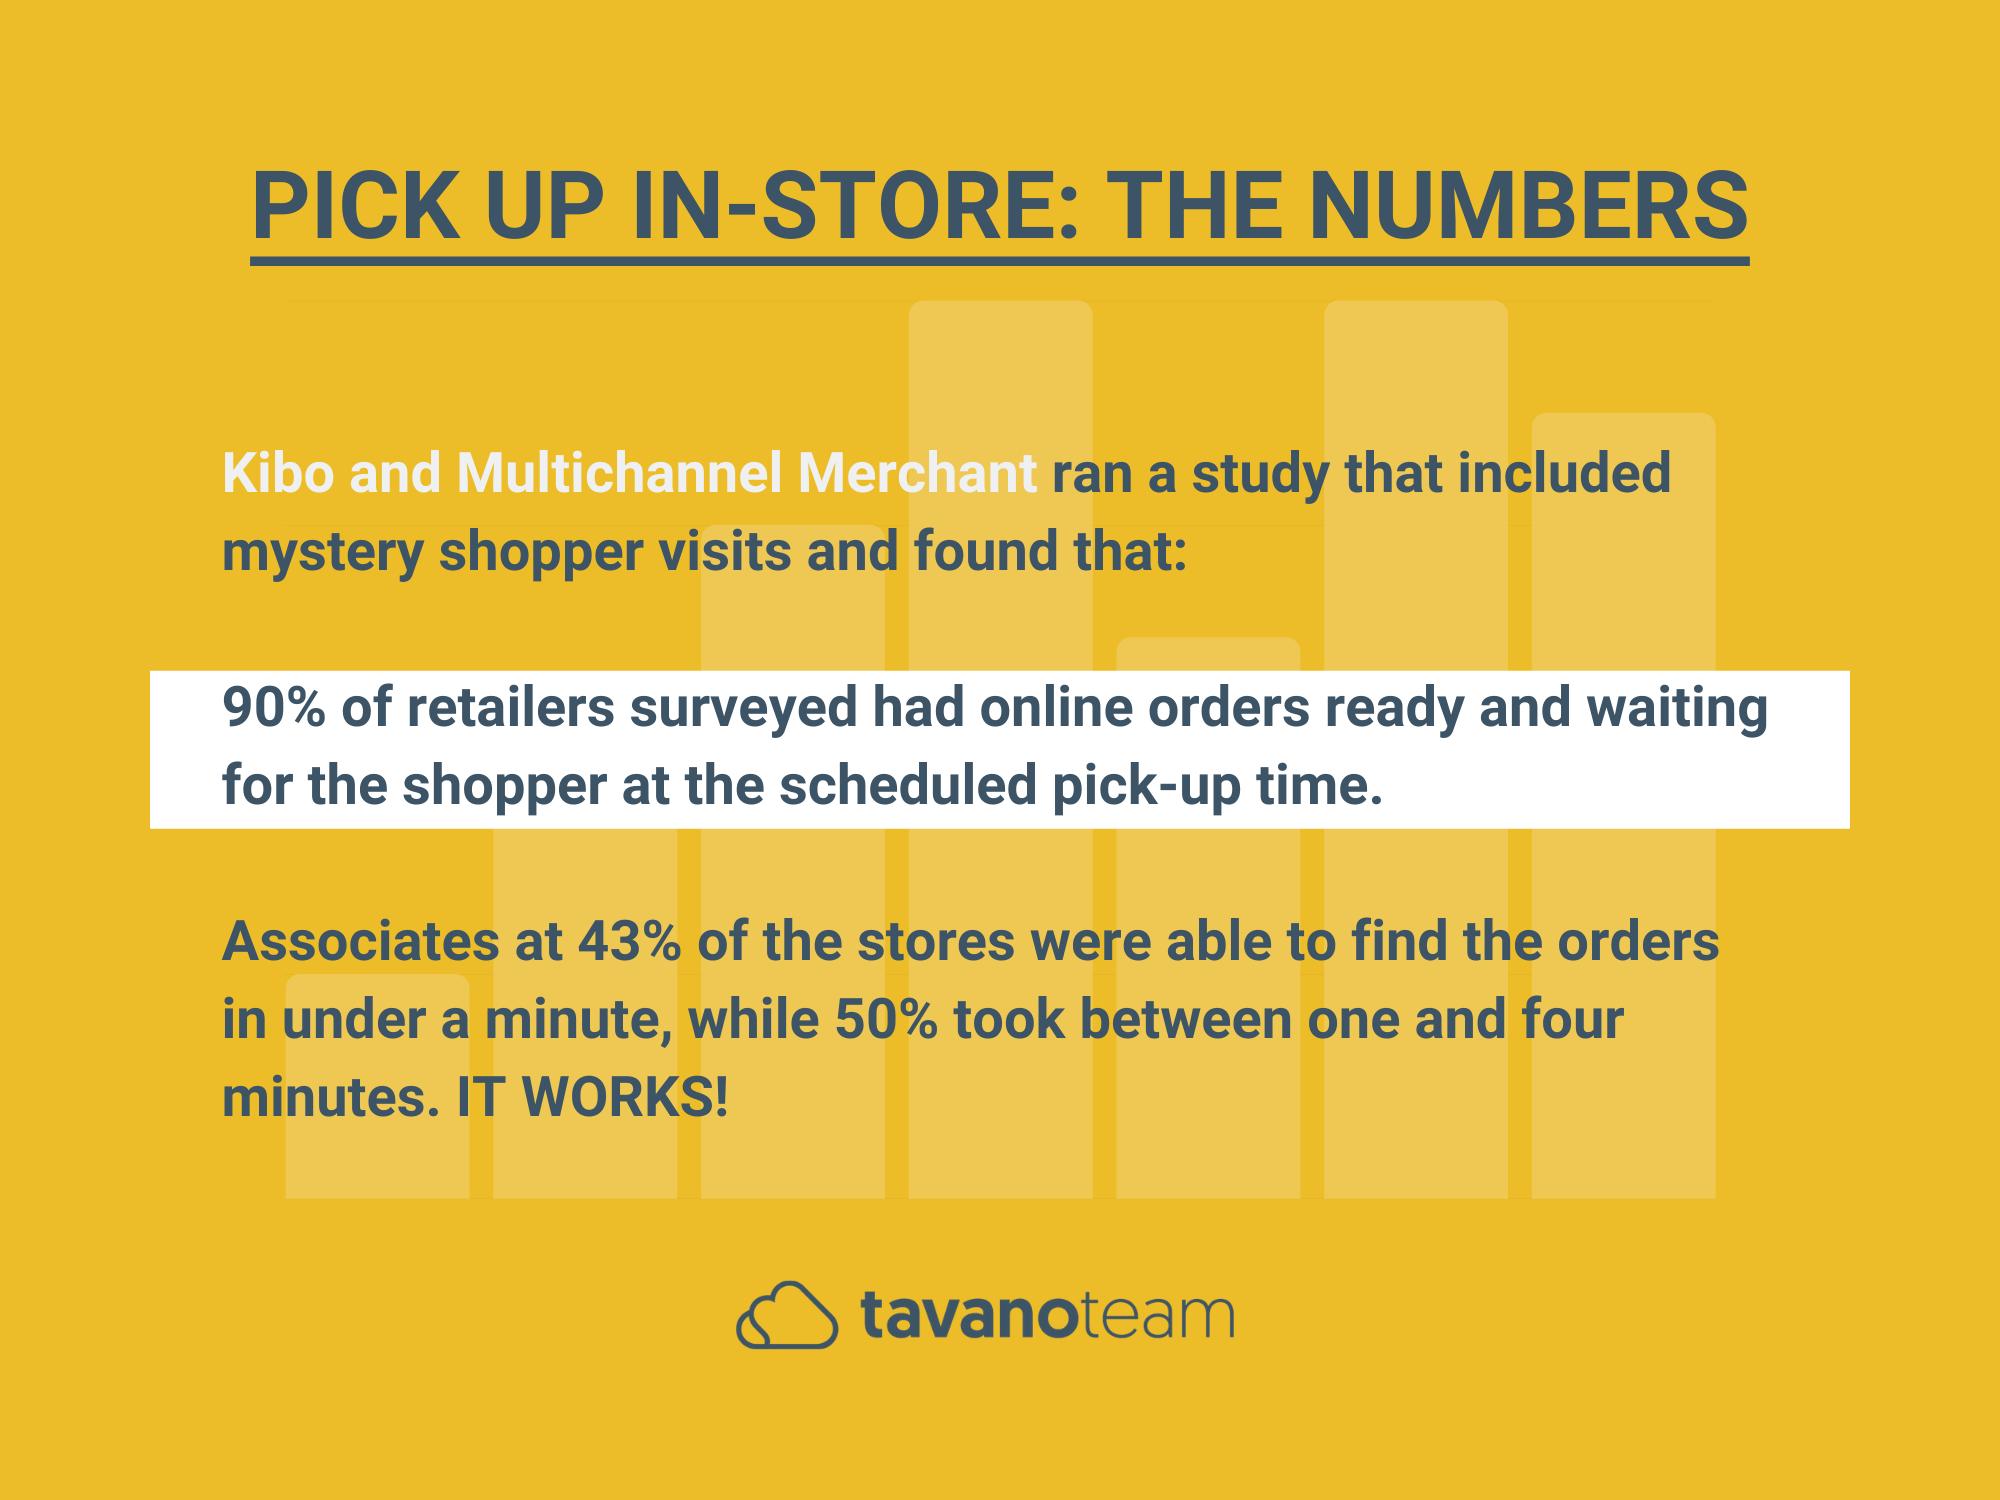 pick-up-in-store-NUMBERS-tavano-team